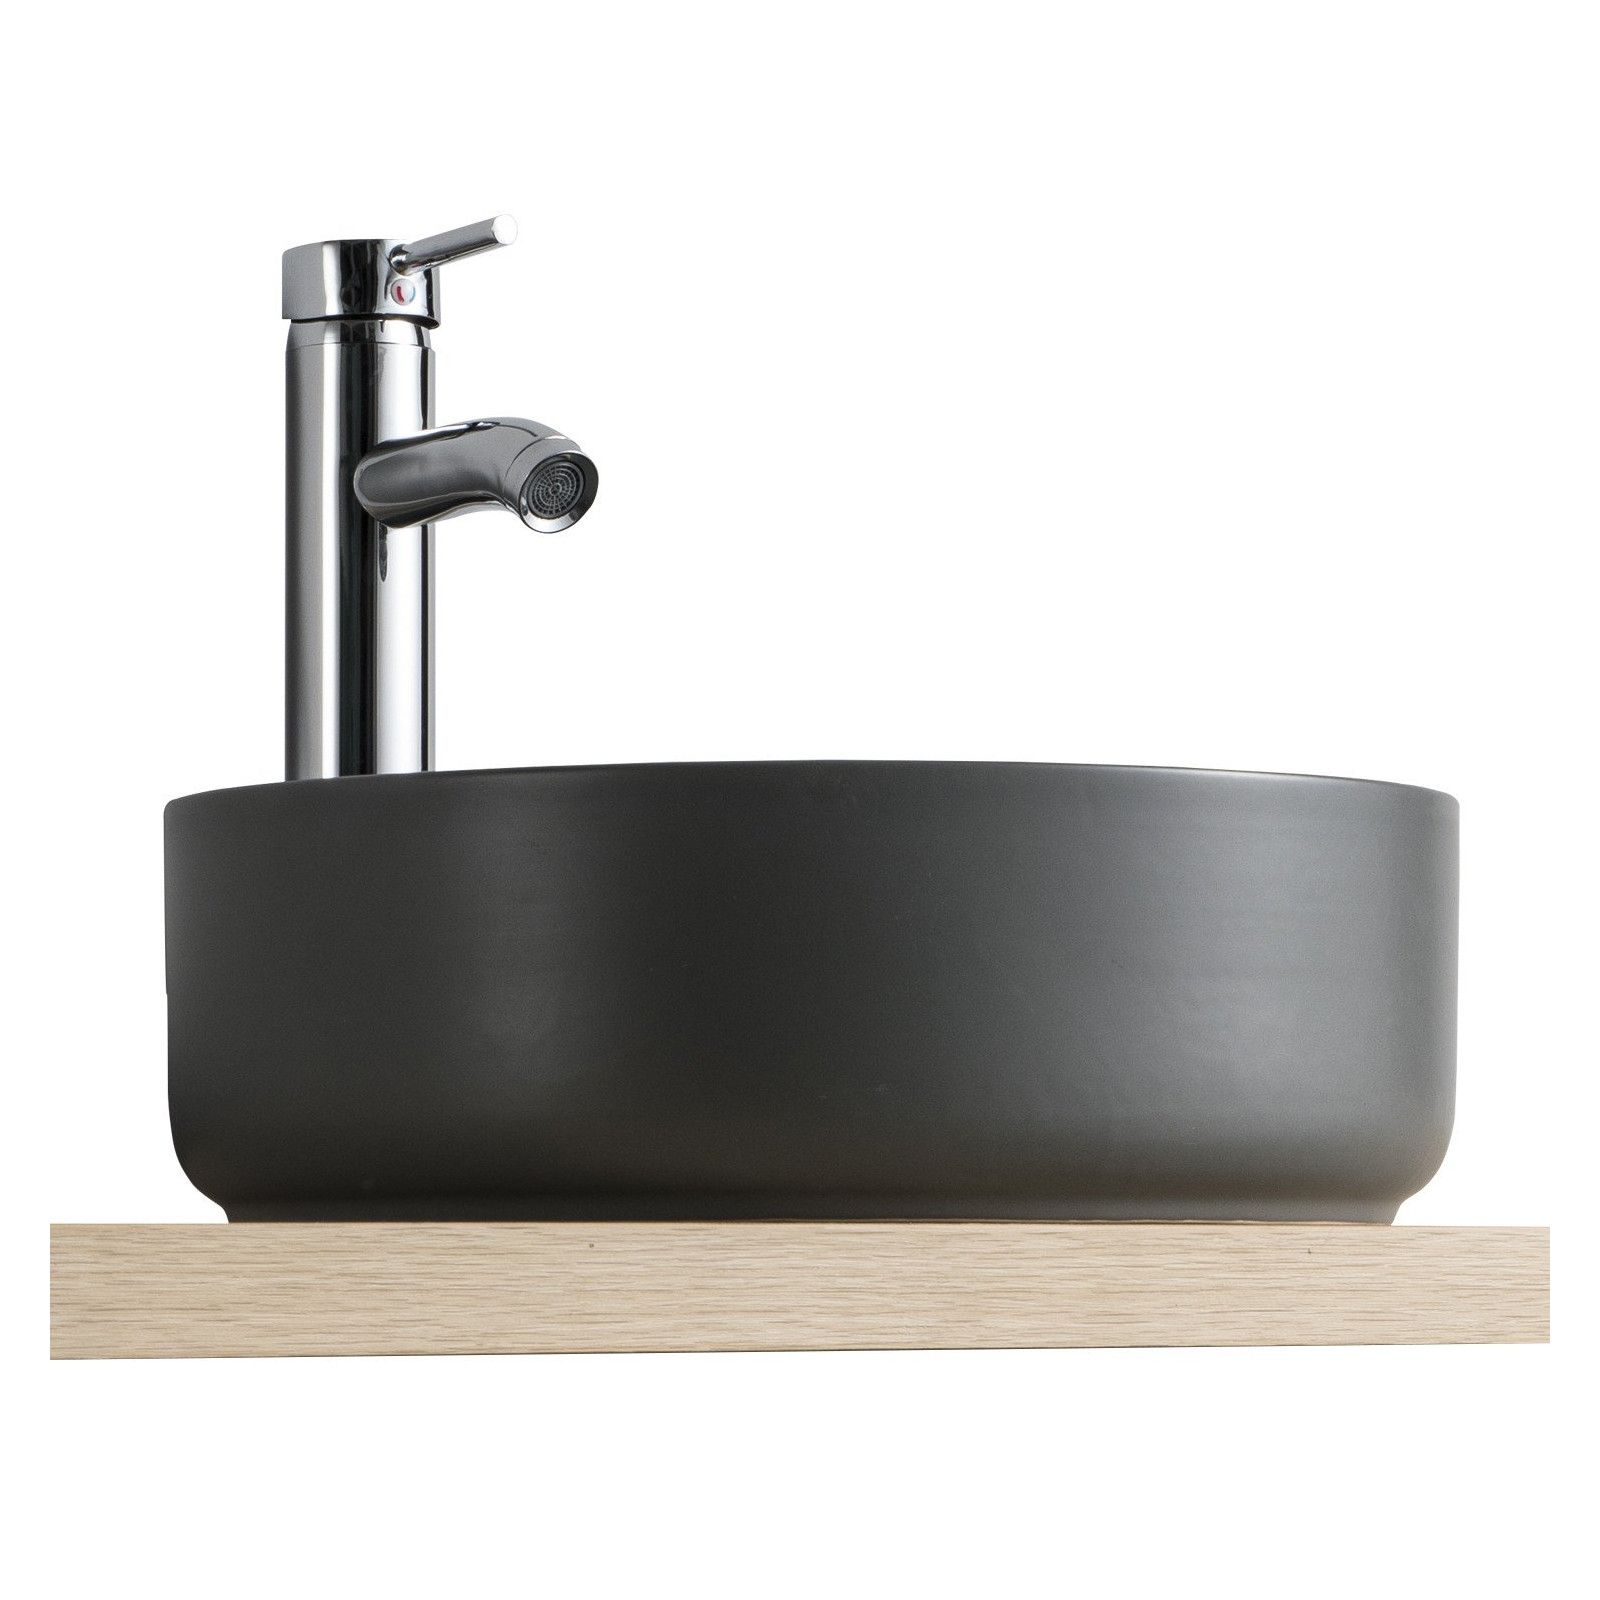 Vasque Salle de bain Ronde à Poser - Ø 37cm Céramique DIEGO